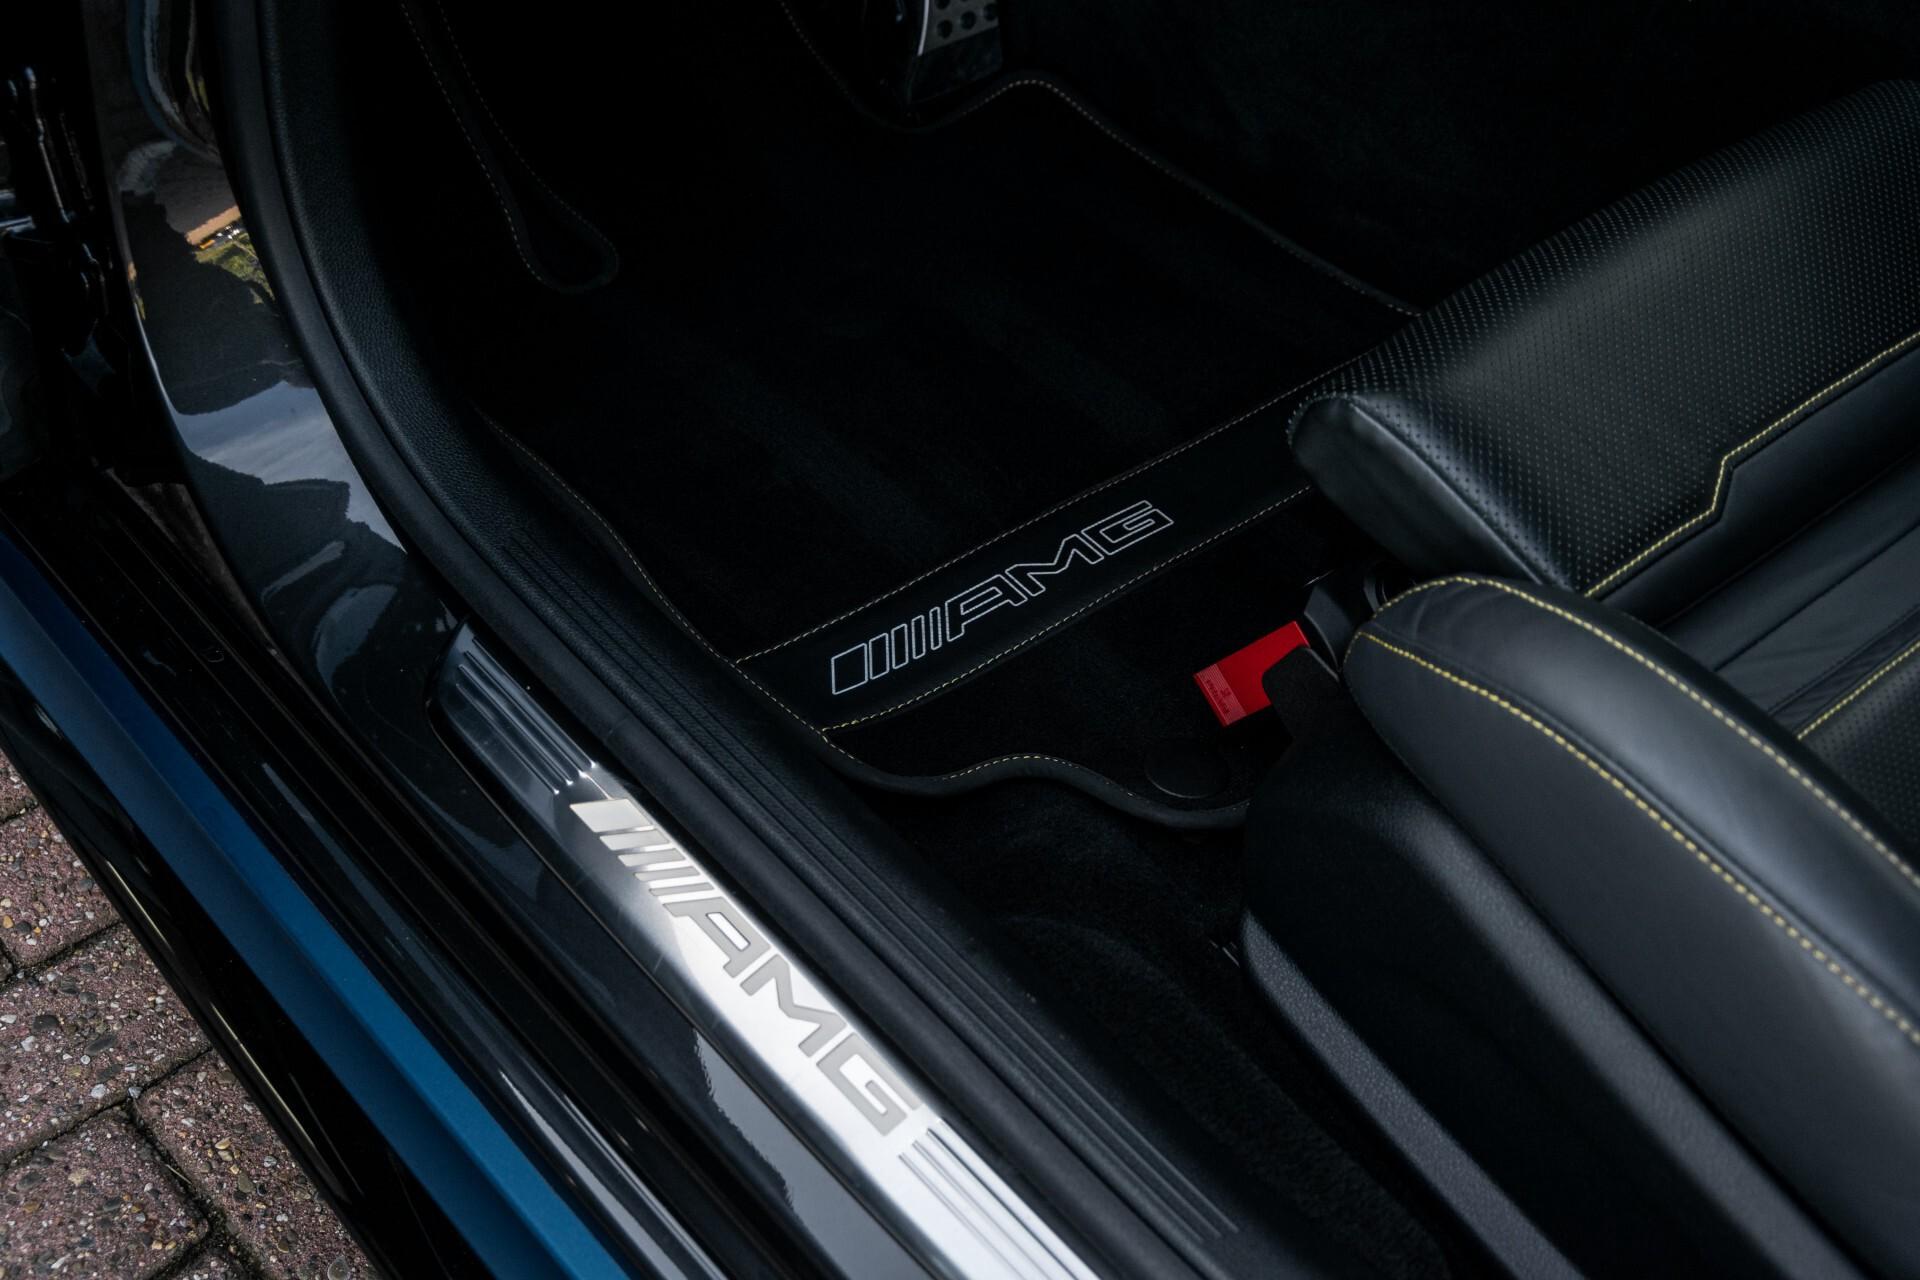 Mercedes-Benz AMG GT 4-Door Coupe 63 S 4MATIC+ Edition 1 Keramisch/Carbon/First Class/Dynamic Plus/Burmester High End 3D Aut9 Foto 38